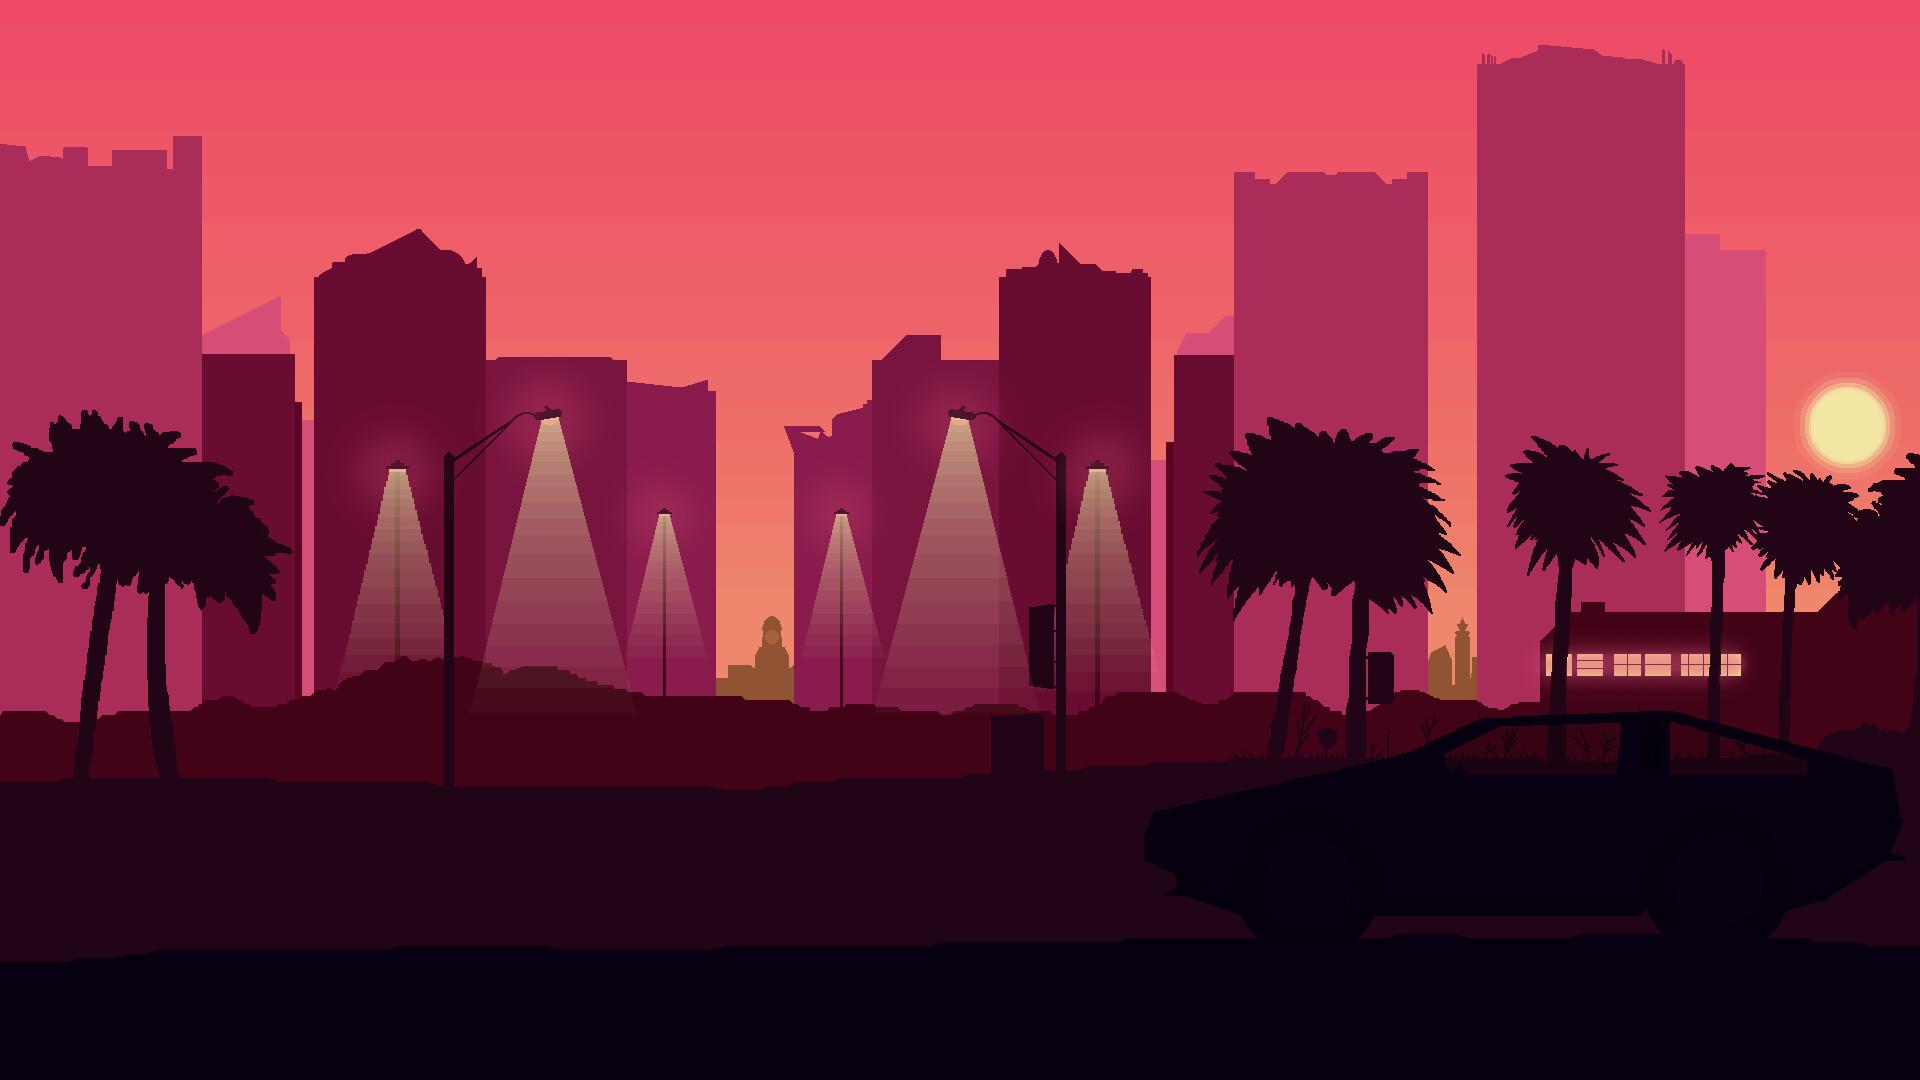 Artstation Hotline Miami Sunset Pixel Art Dawid Szypura